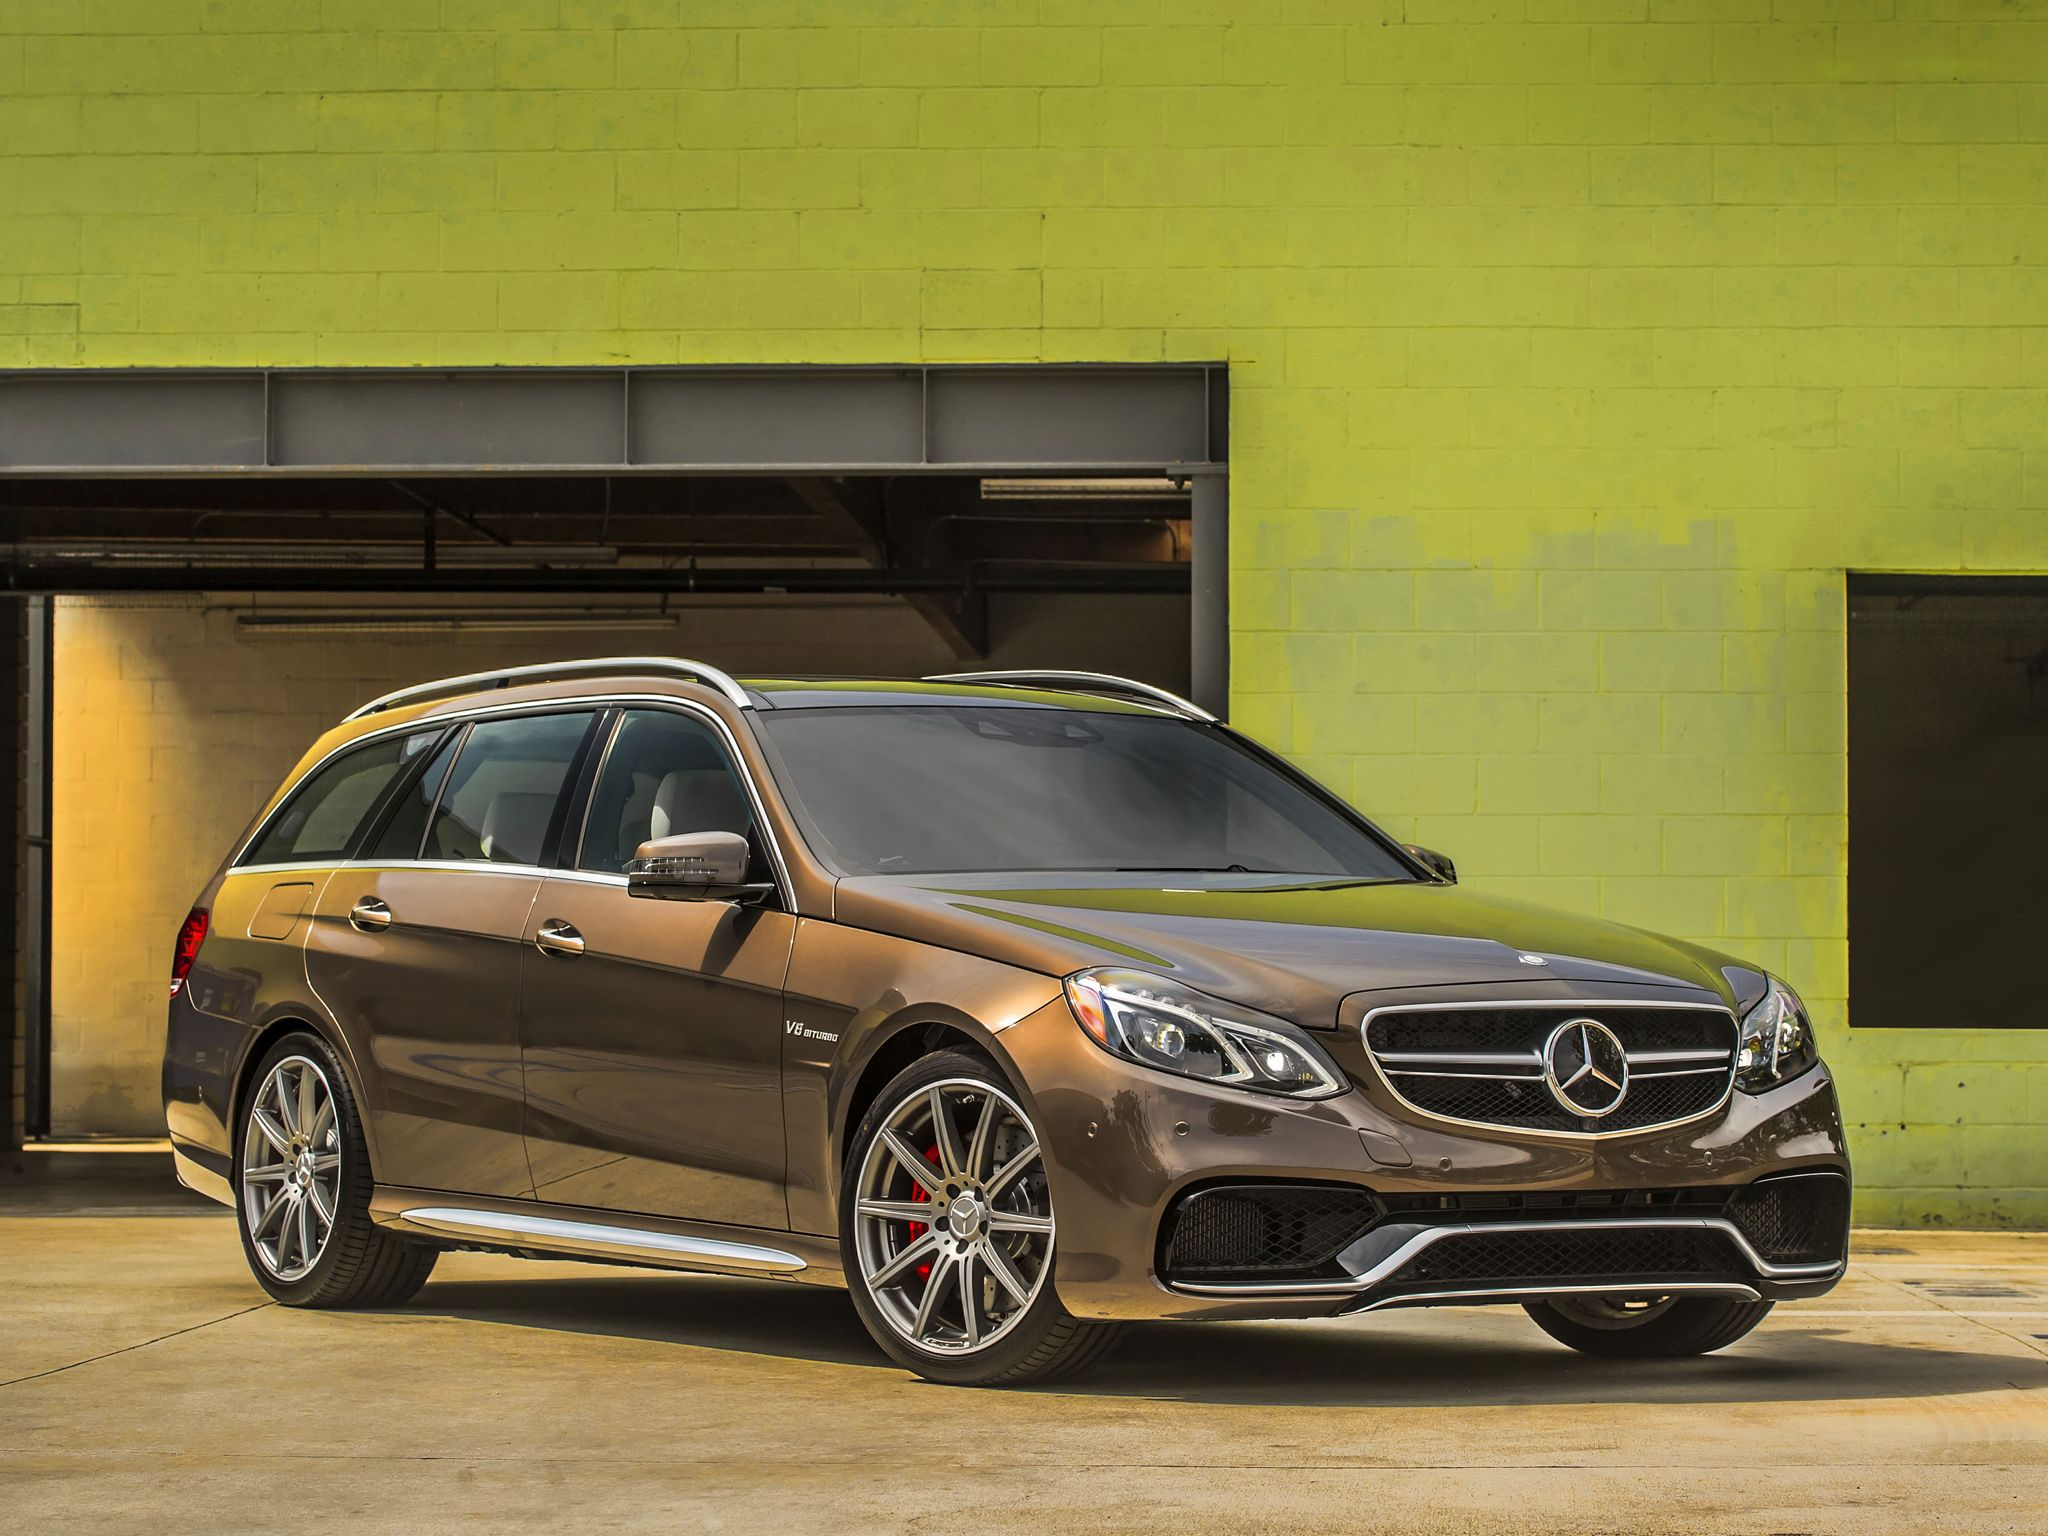 2013 Mercedes-Benz E 63 AMG S-Model Estate | Touring Estate Cars ...